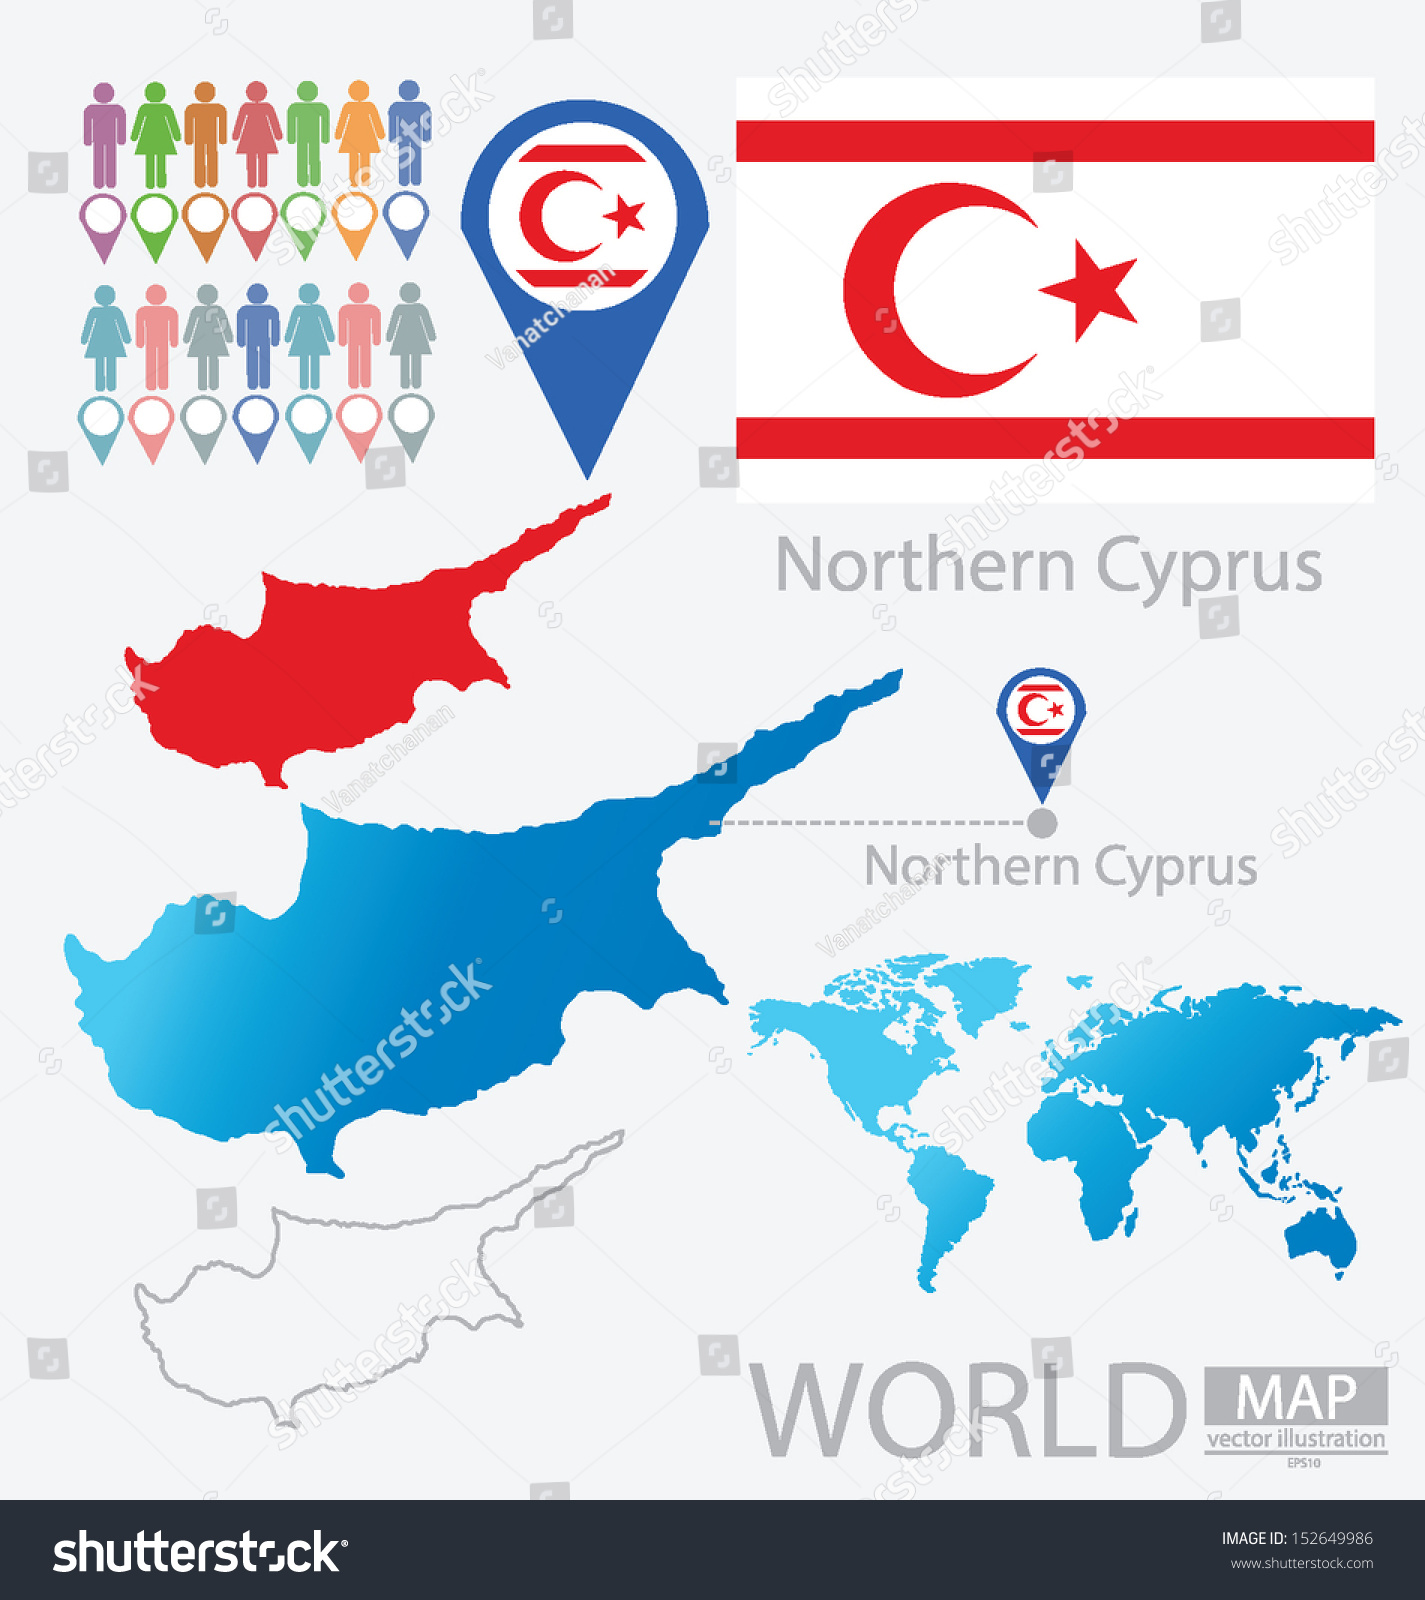 Turkish republic northern cyprus flag world stock vector royalty turkish republic of northern cyprus flag world map vector illustration gumiabroncs Images